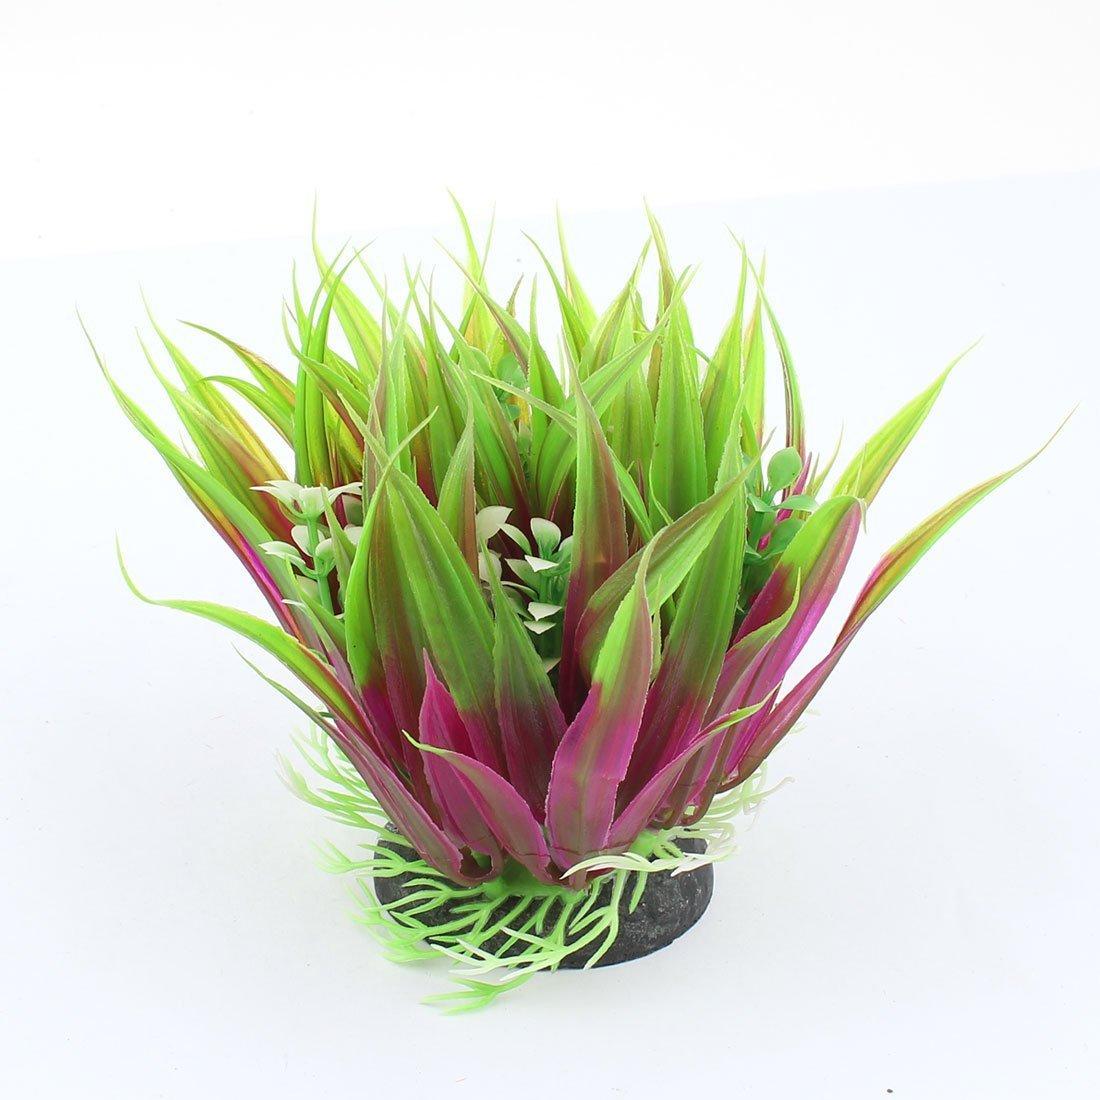 1Pc Aquarium Artificial Water Grass Plant Decor 12cm High Green Purple